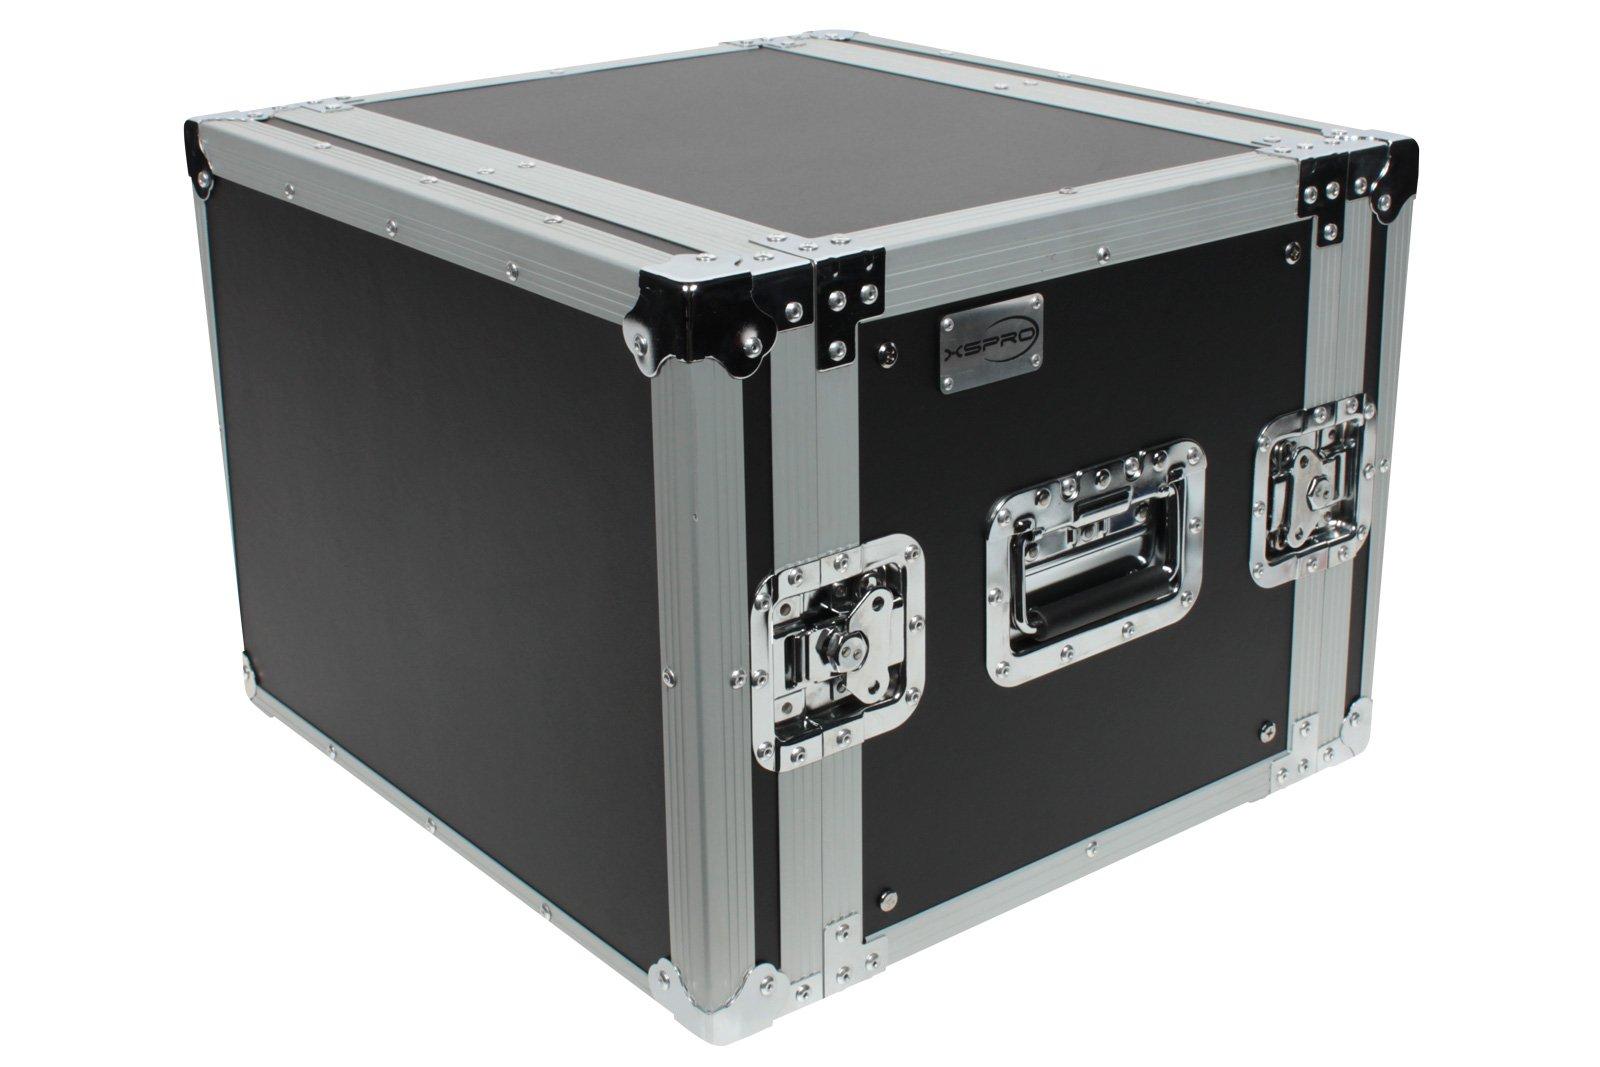 XSPRO XS8U-14 8 Space 8U ATA Effects Road Tour Flight Rack Case 19'' Wide